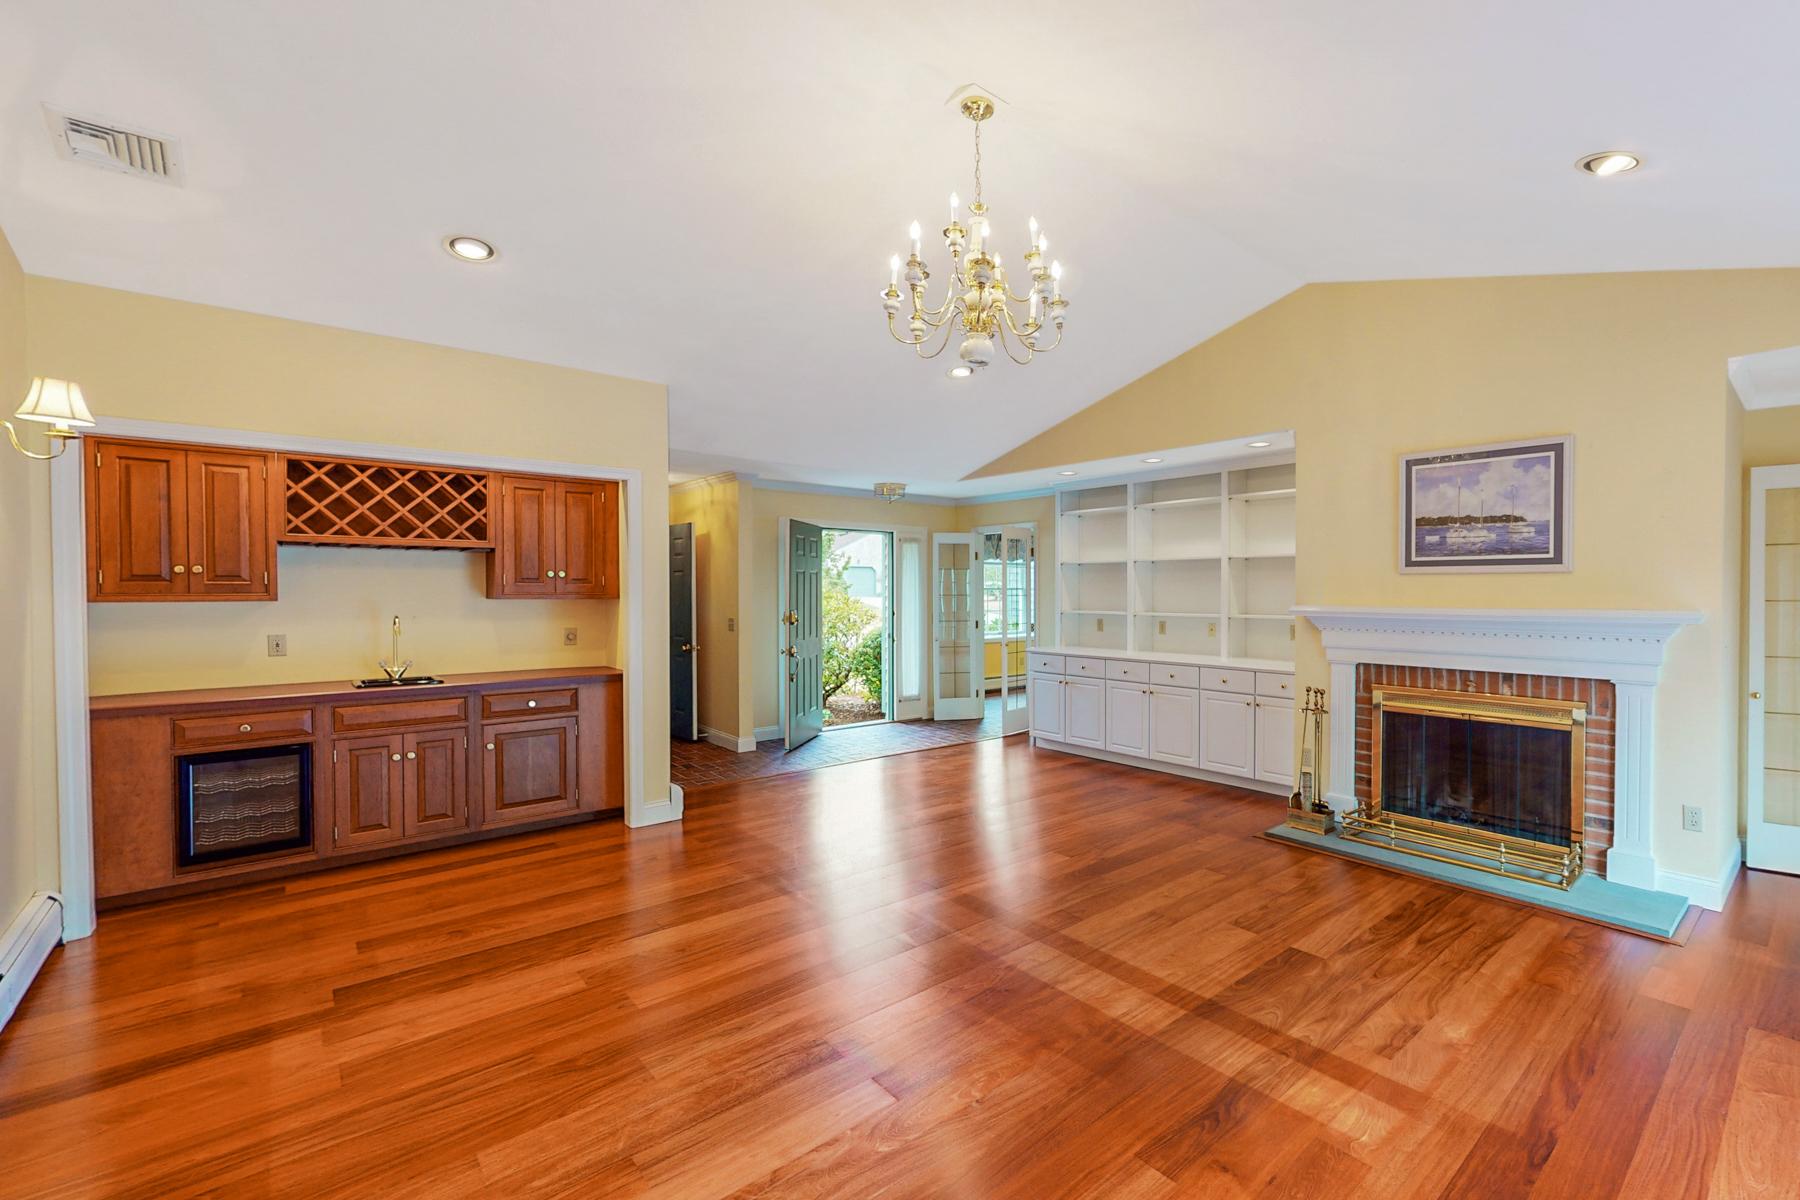 Condominiums 为 销售 在 Single Level Condo in Quiet Community 115 Young Drive 朴茨茅斯, 罗得岛 02871 美国